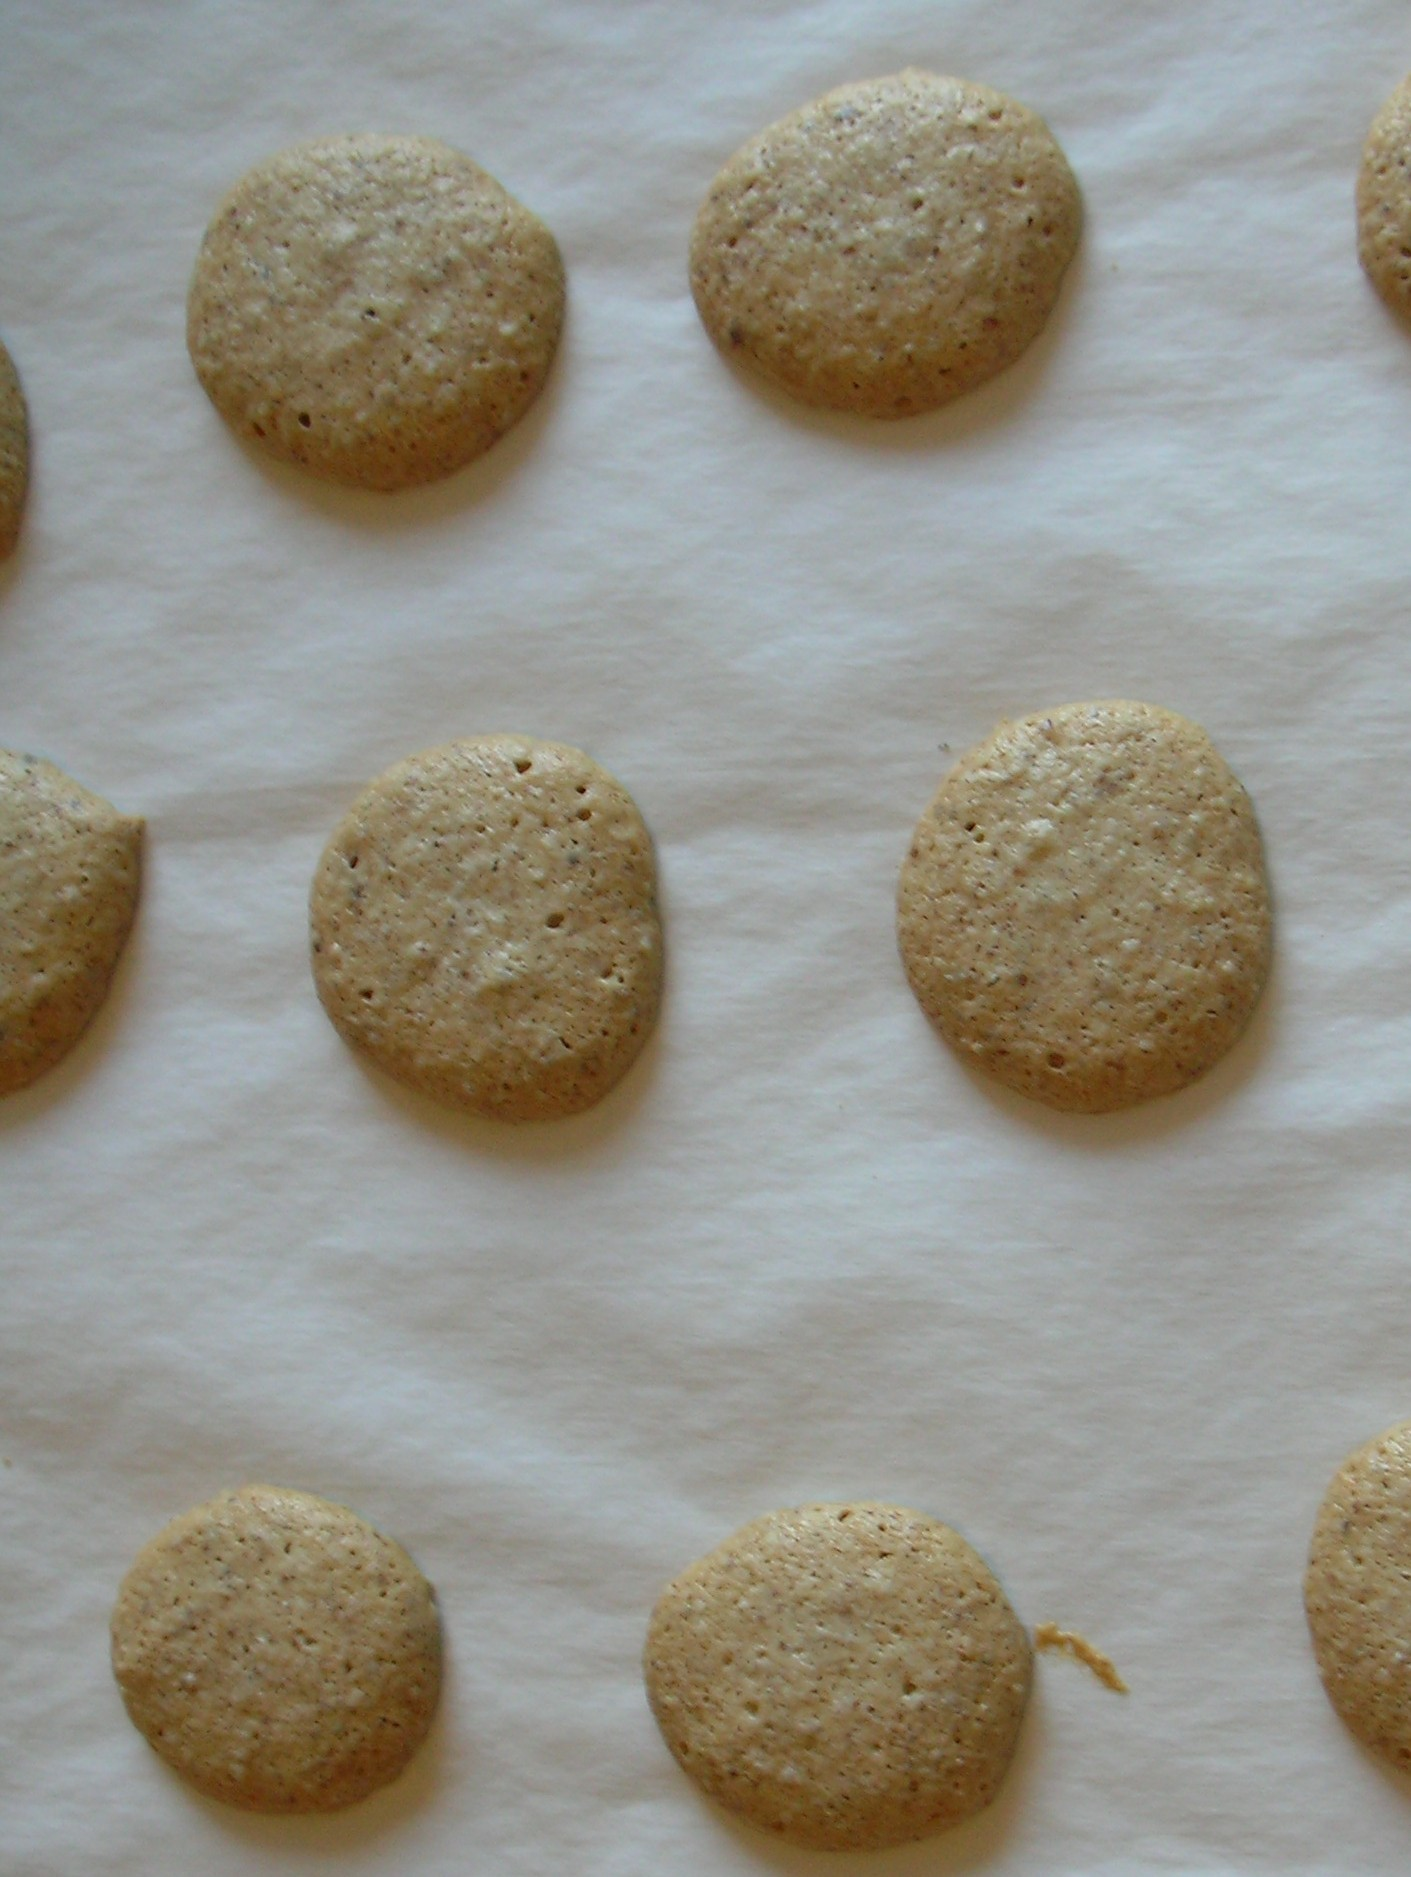 amaretti, fresh from the oven